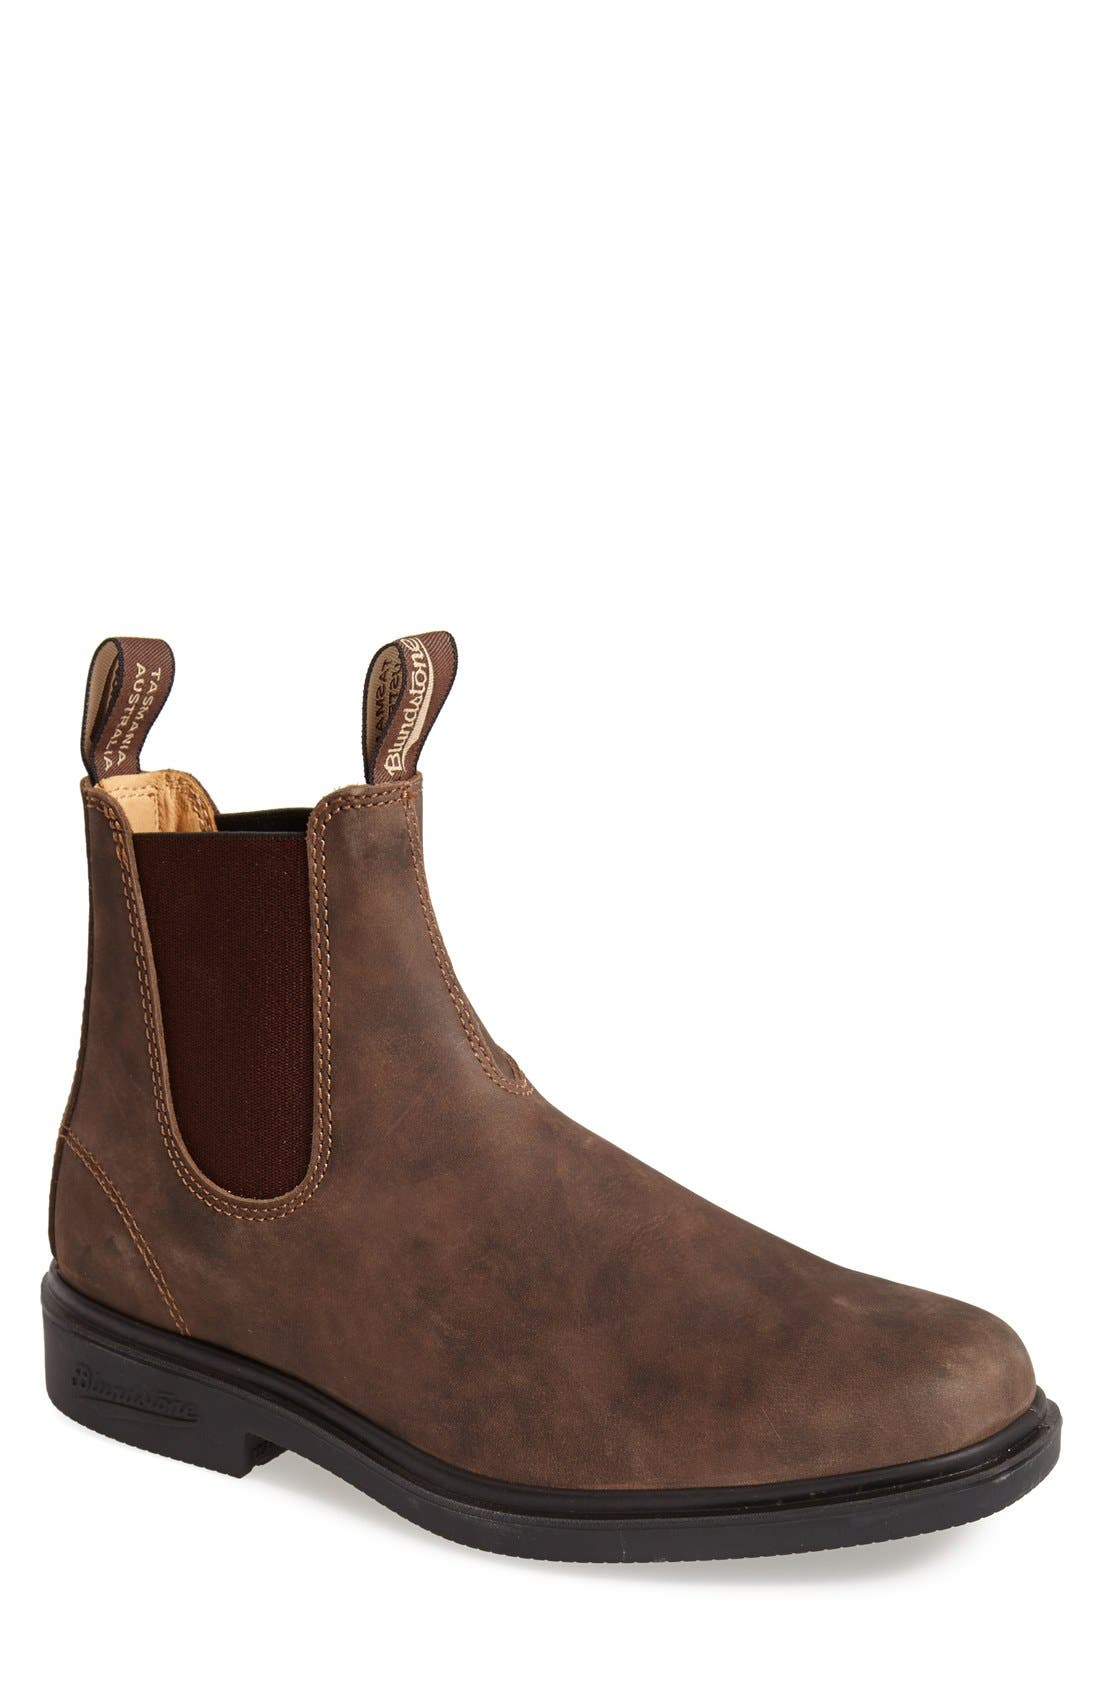 BLUNDSTONE FOOTWEAR, Chelsea Boot, Main thumbnail 1, color, RUSTIC BROWN